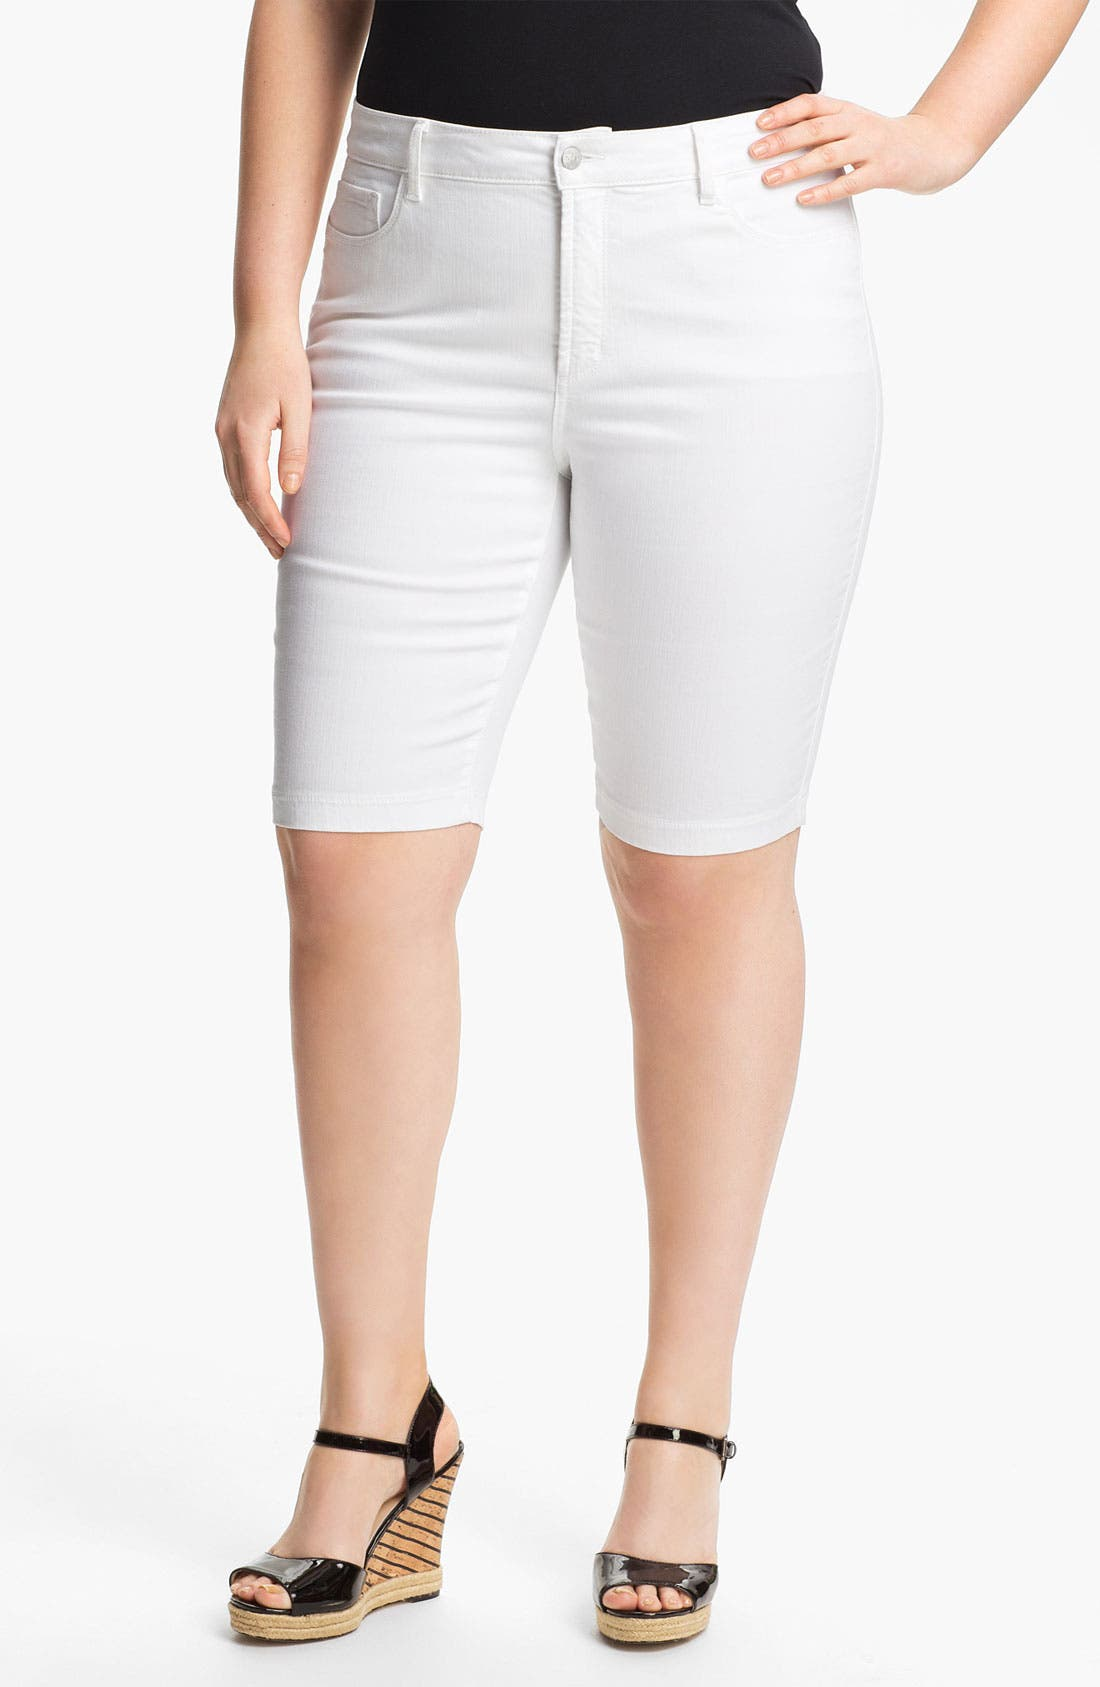 Alternate Image 1 Selected - NYDJ 'Helen' Stretch Denim Shorts (Plus Size)